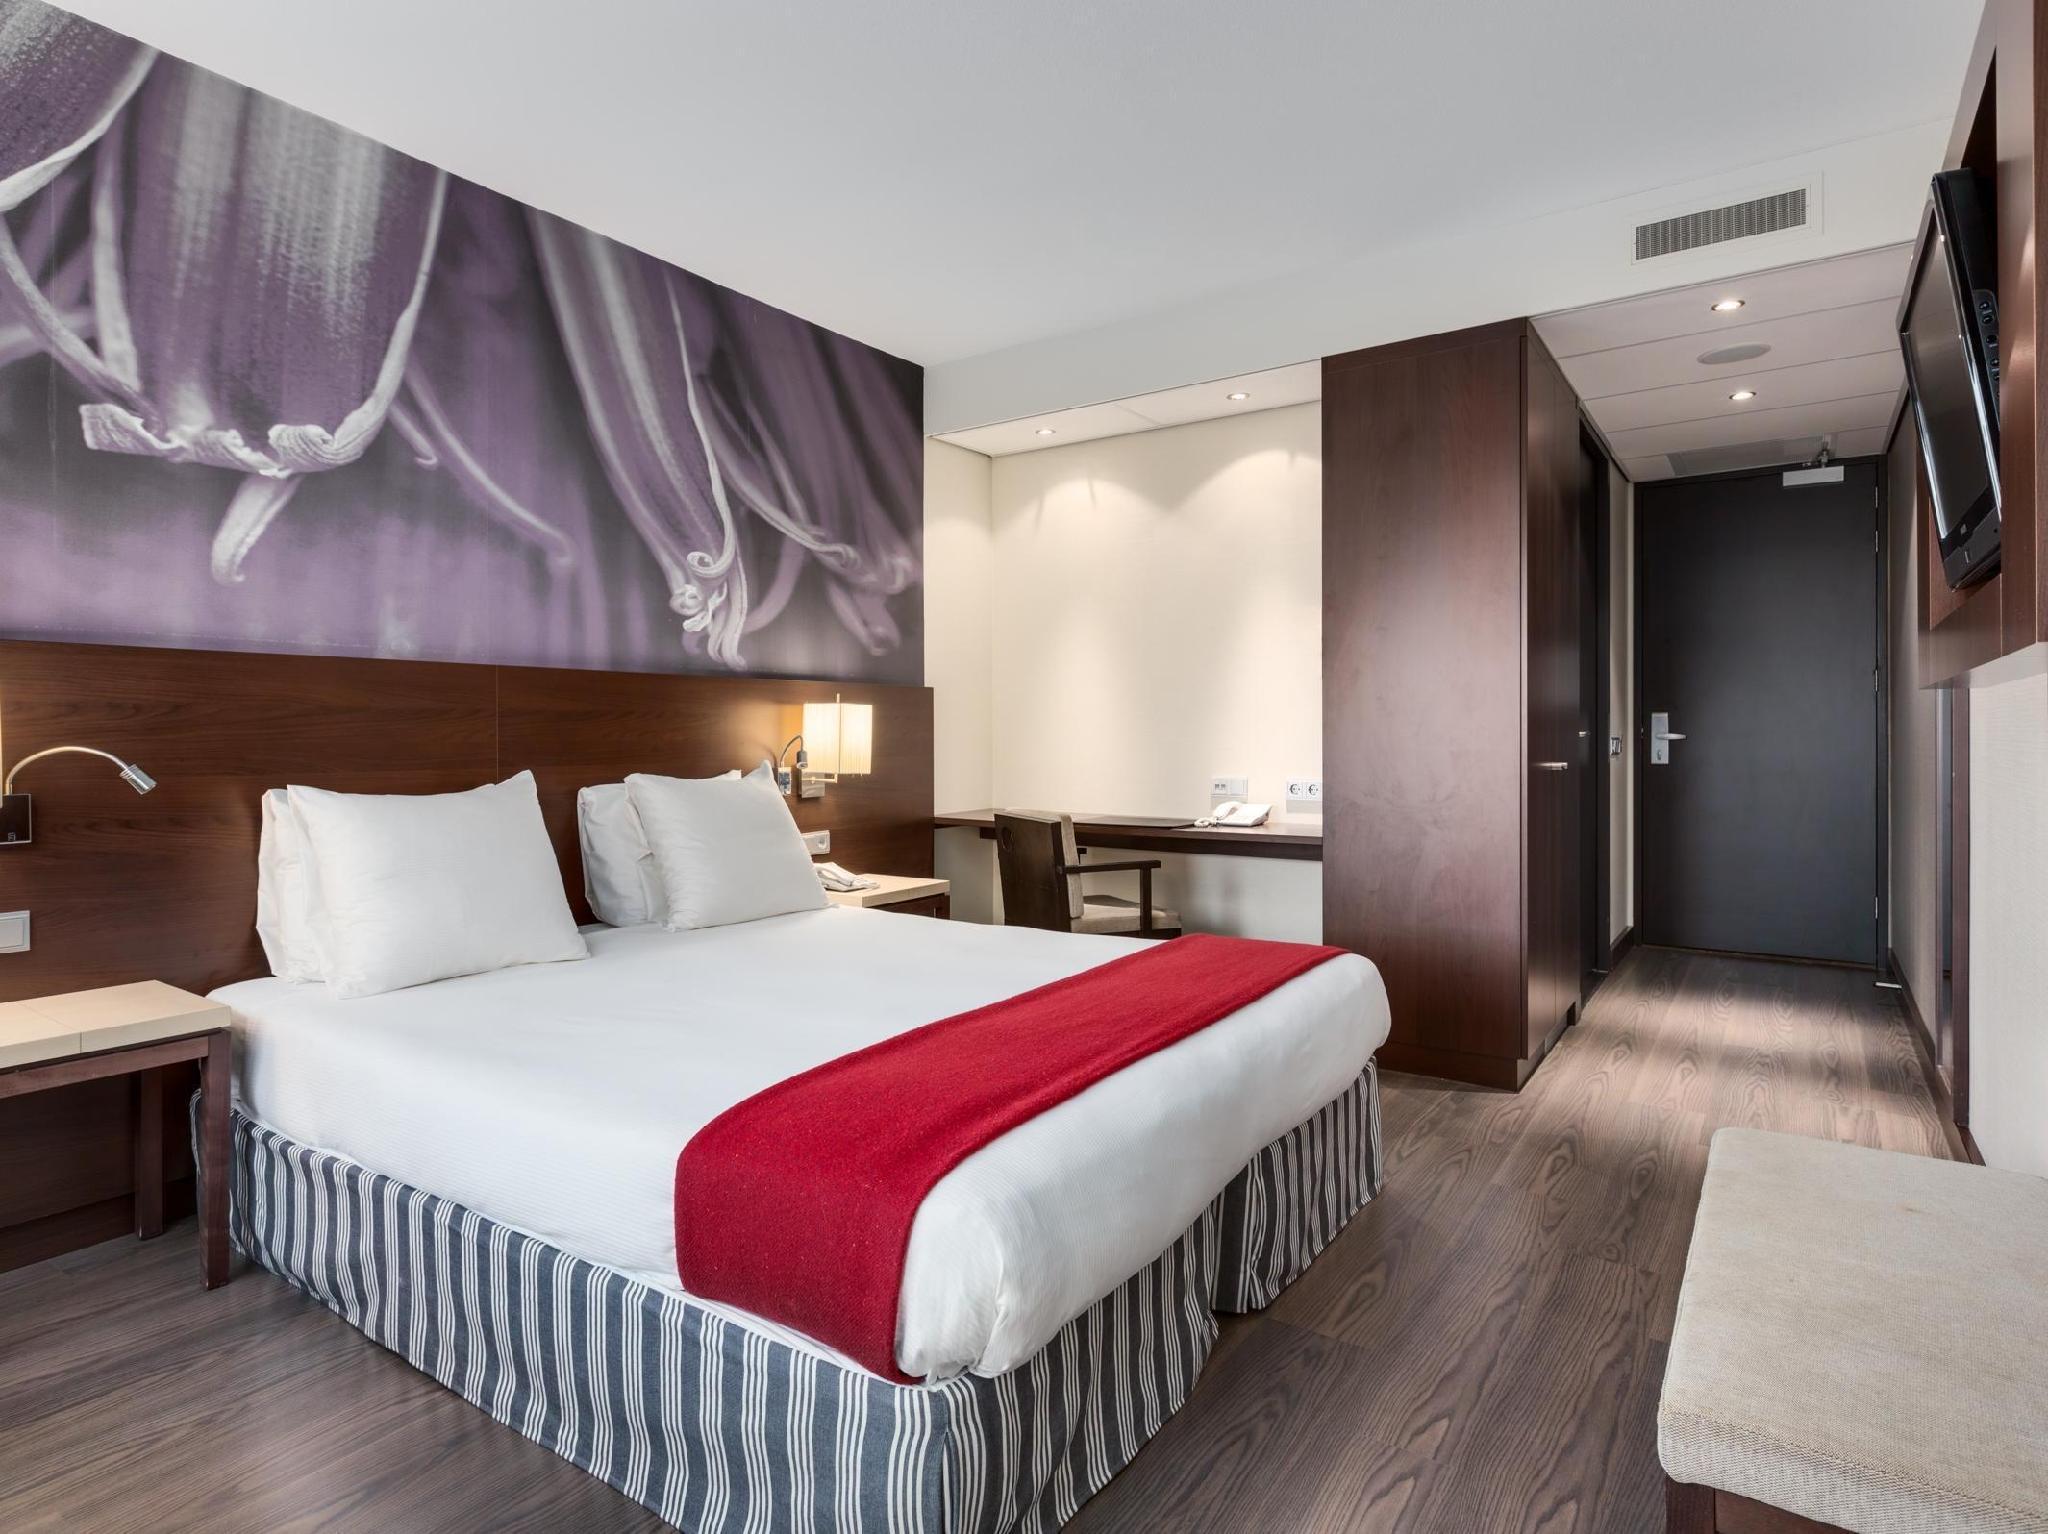 2 Persoonsbed Modern.Nh Amersfoort Hotel Amersfortas Nyderlandai Didziausios Nuolaidos